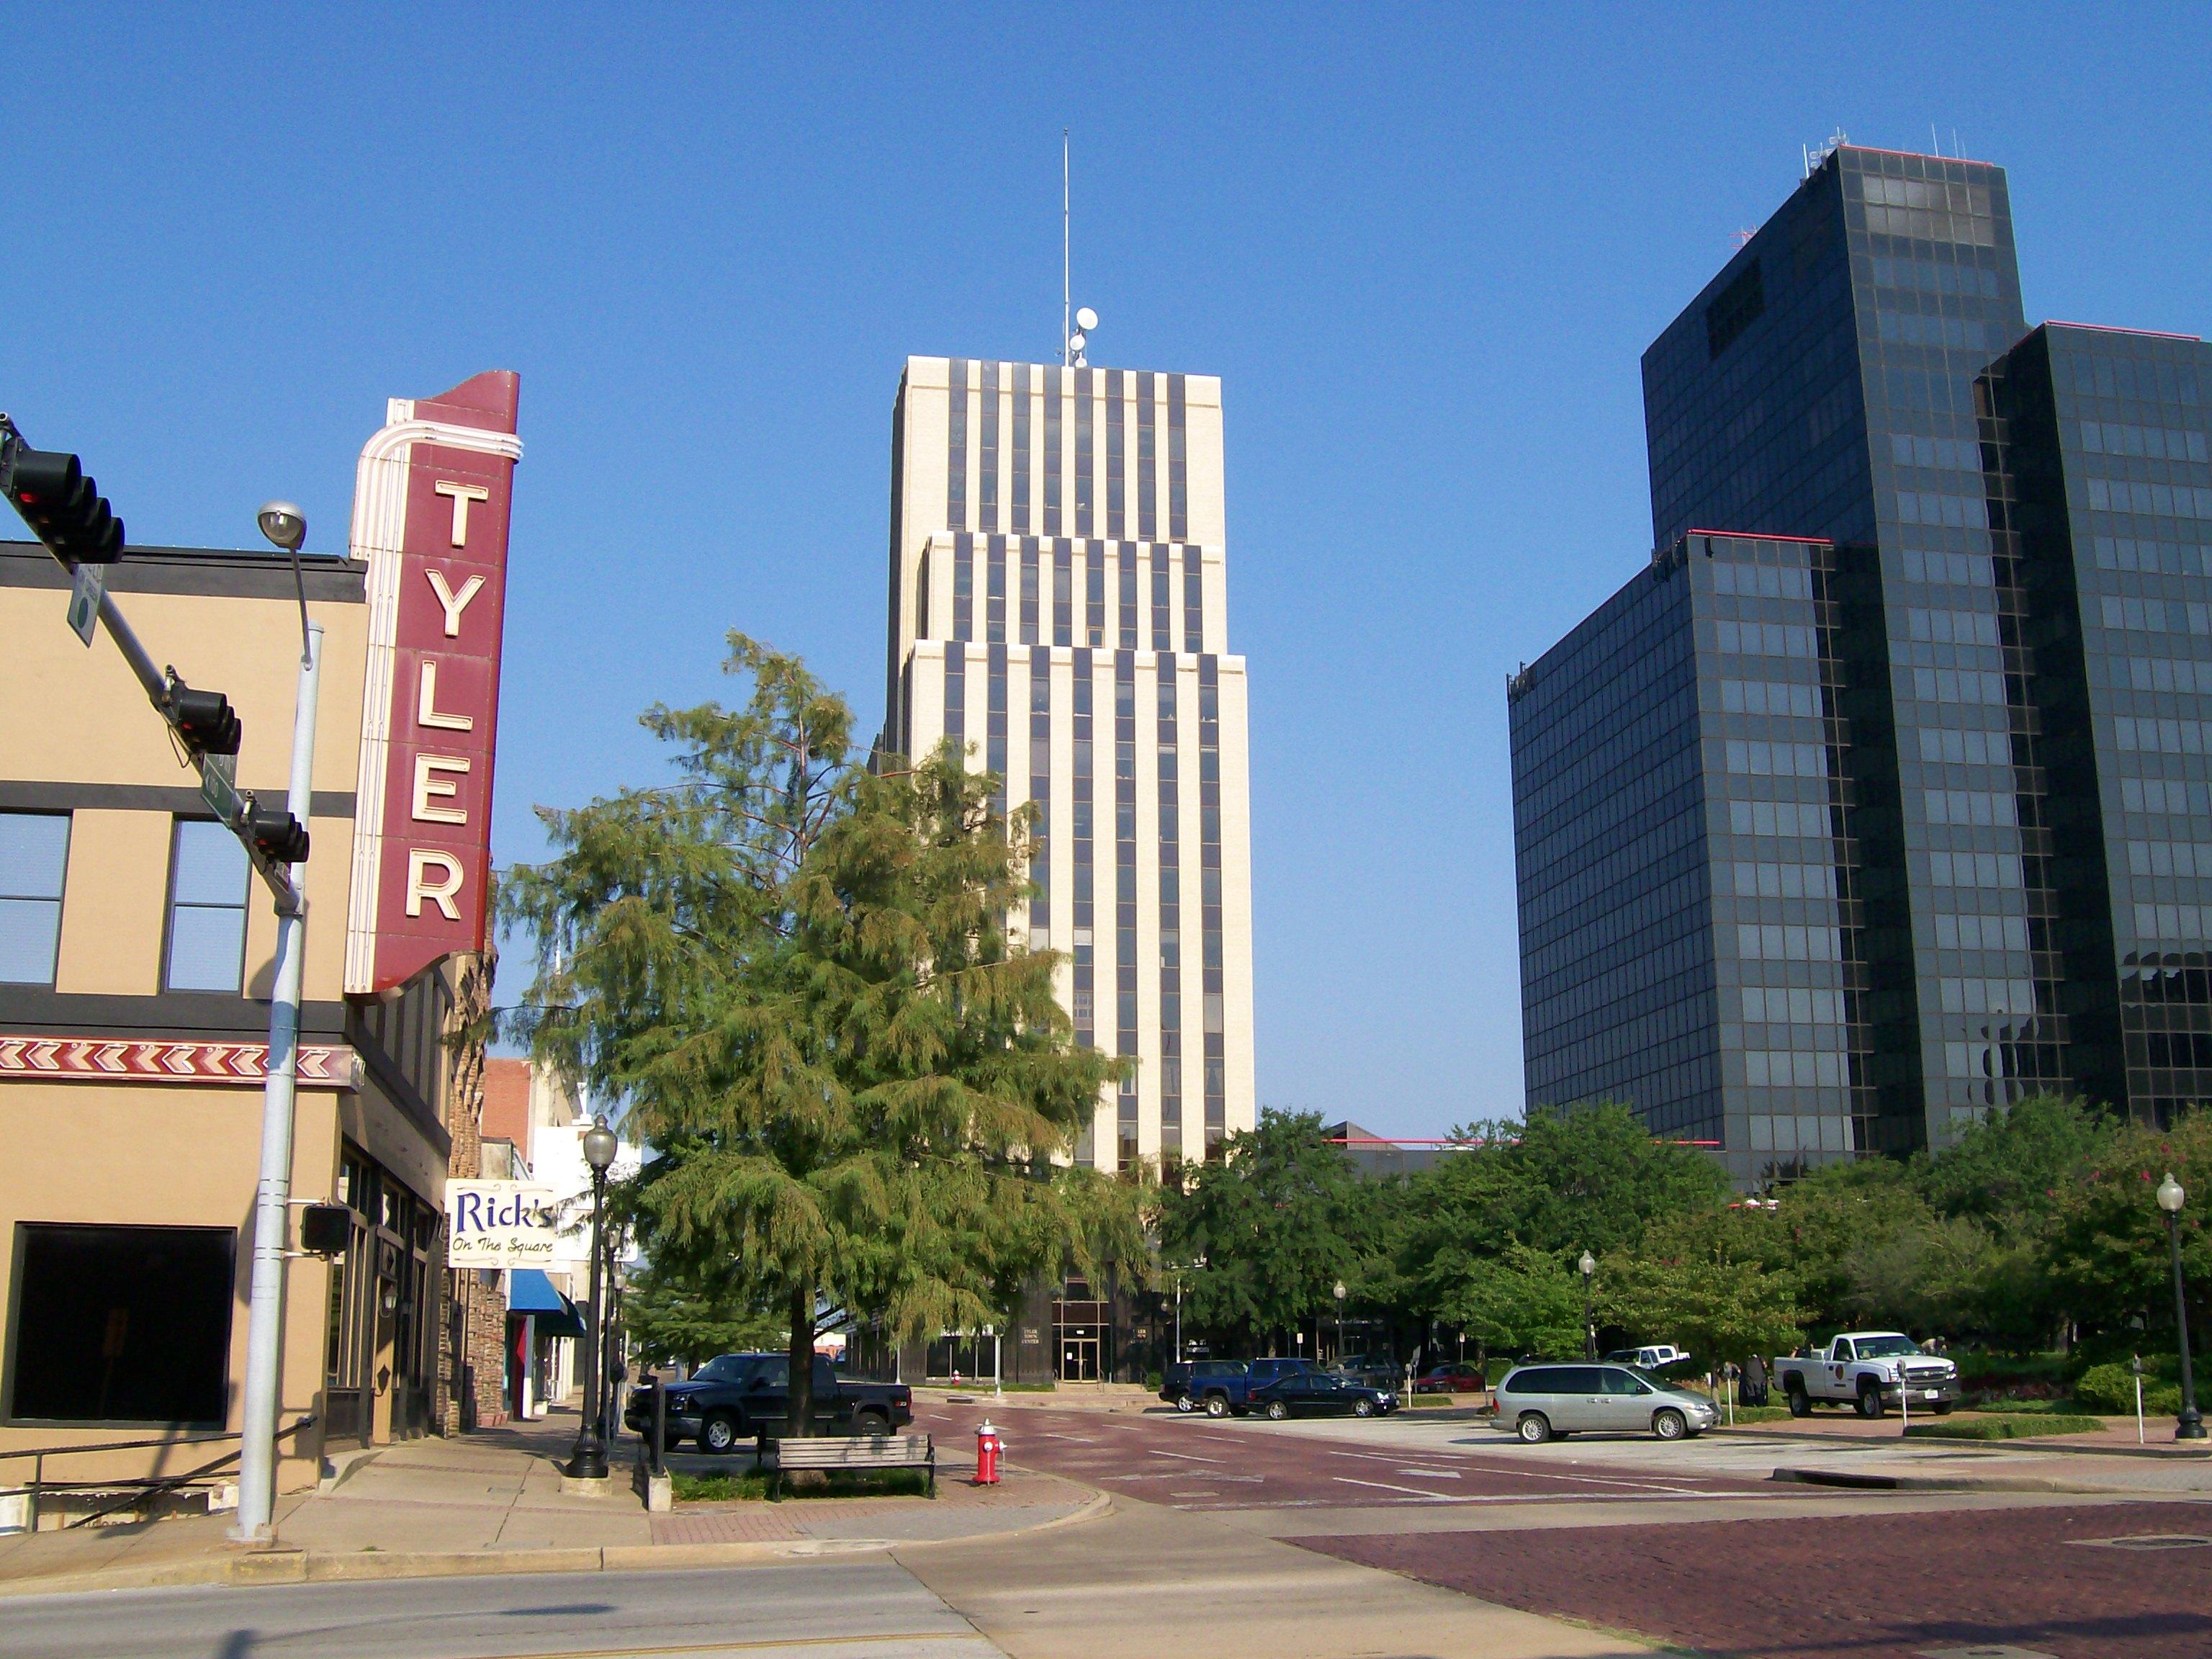 The City of Tyler, Texas